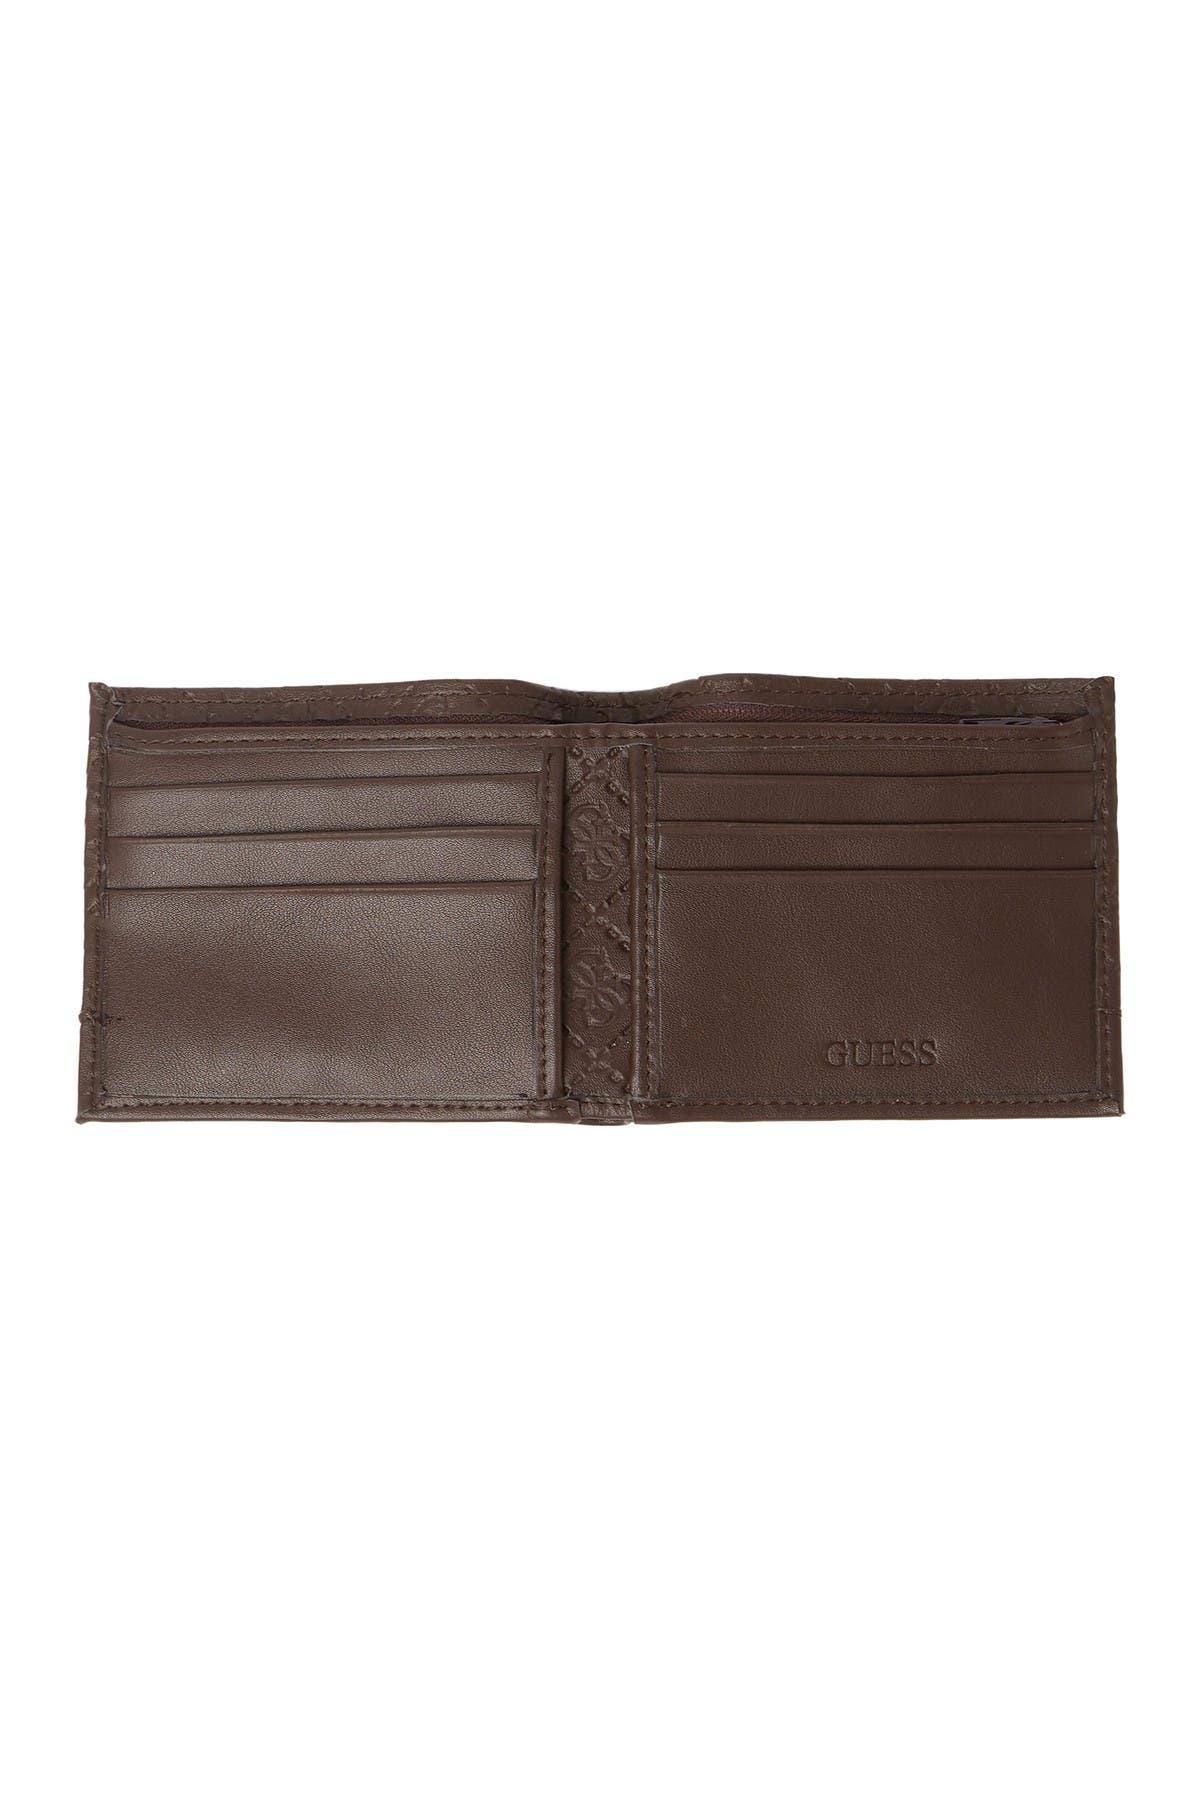 Image of GUESS Duane RFID Slimfold Wallet